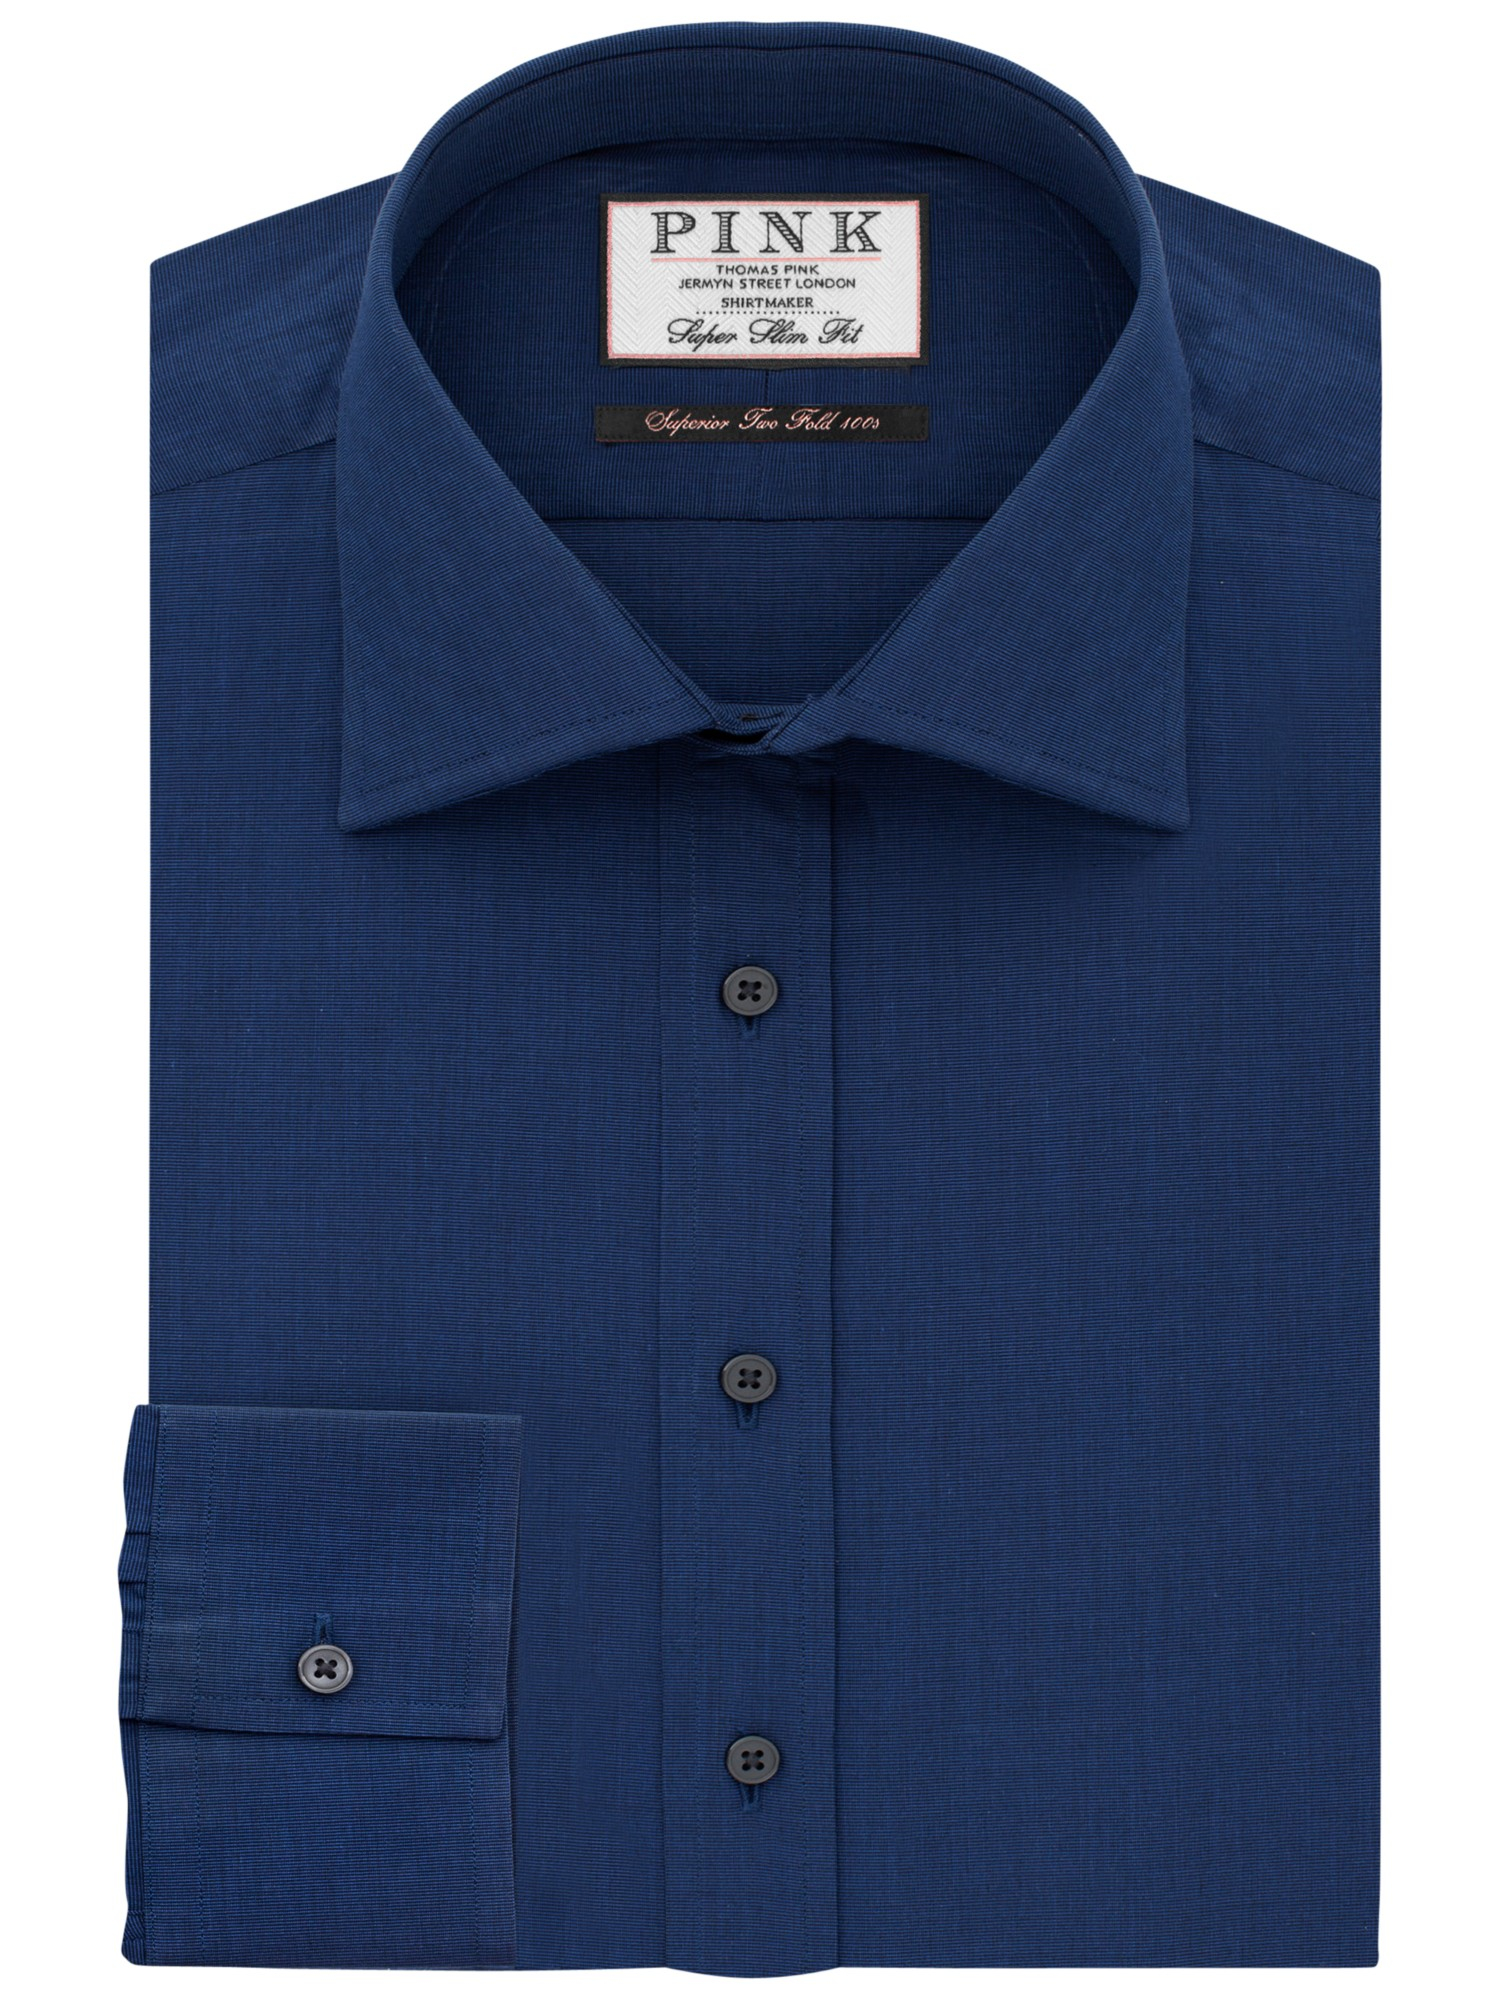 Thomas Pink Derick Plain Super Slim Fit Shirt In Blue For